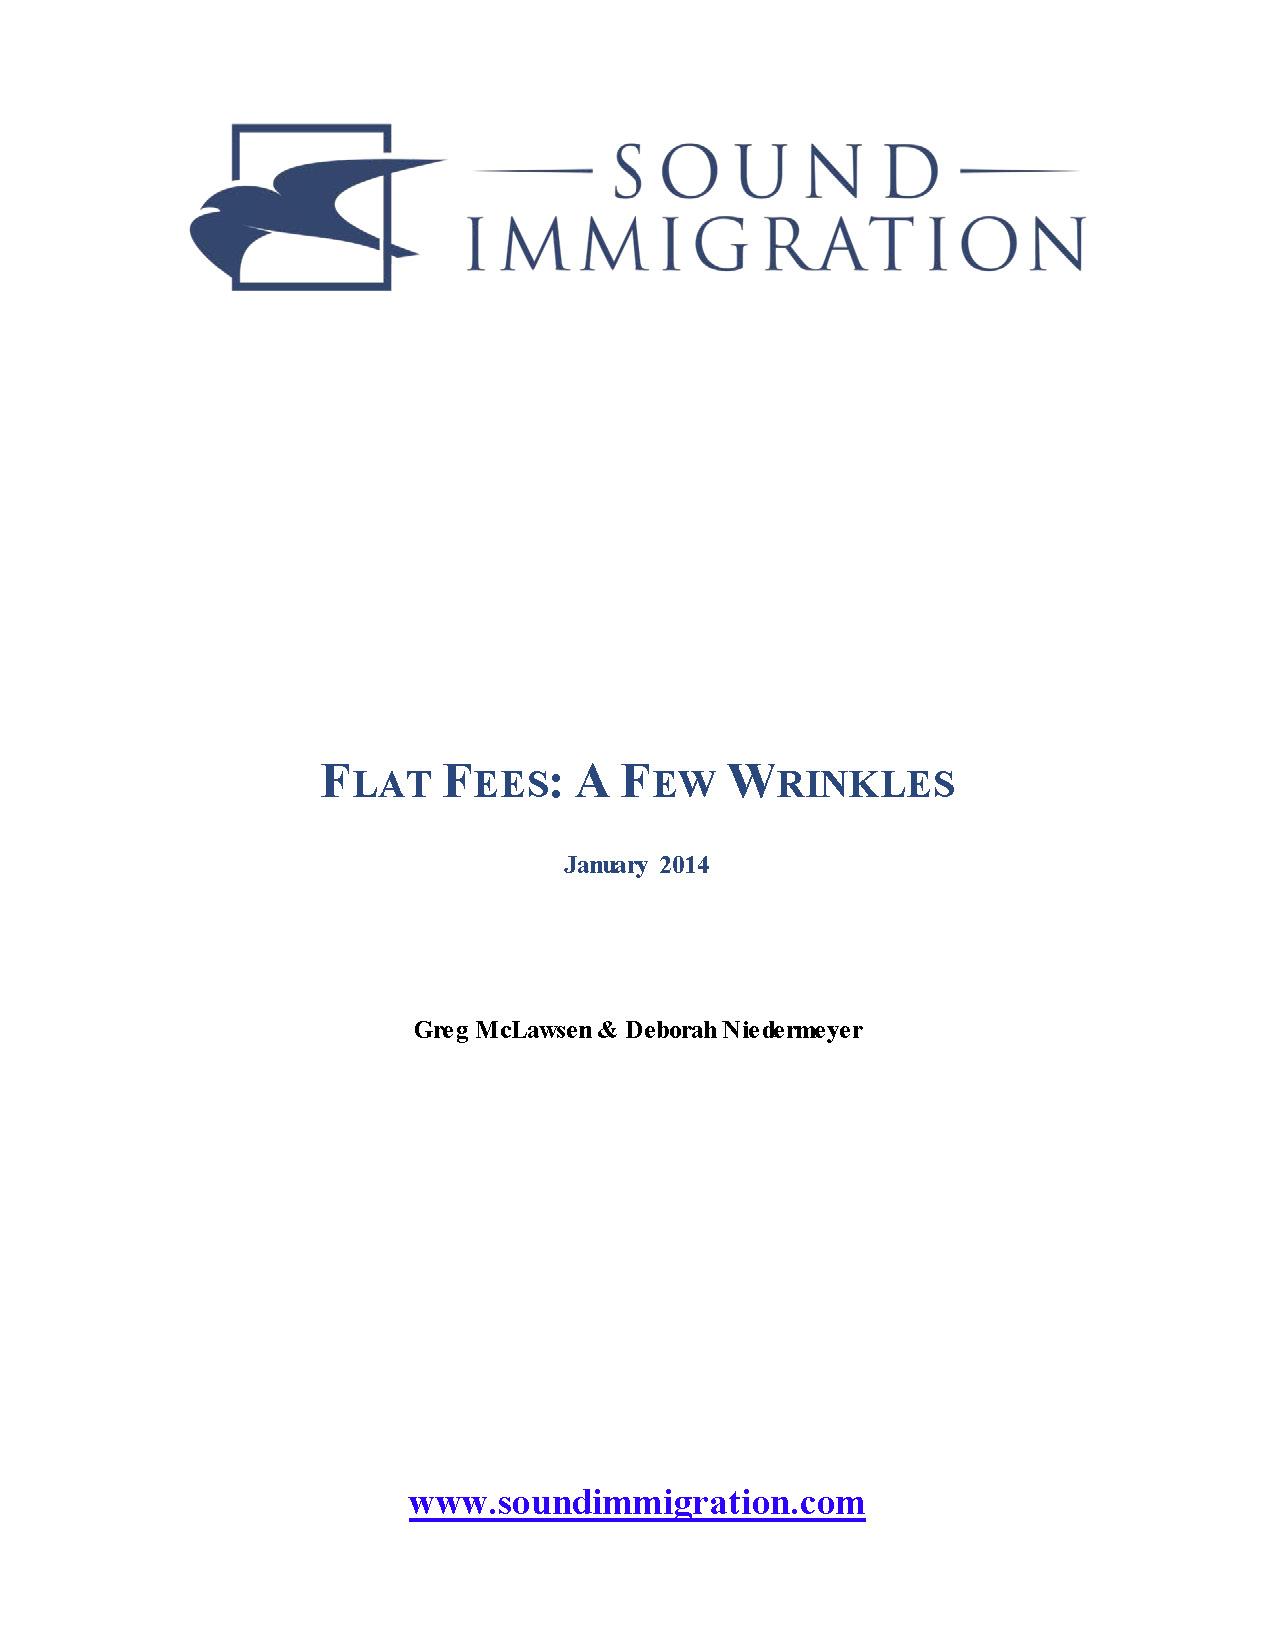 Flat Fees jpg_Page_1